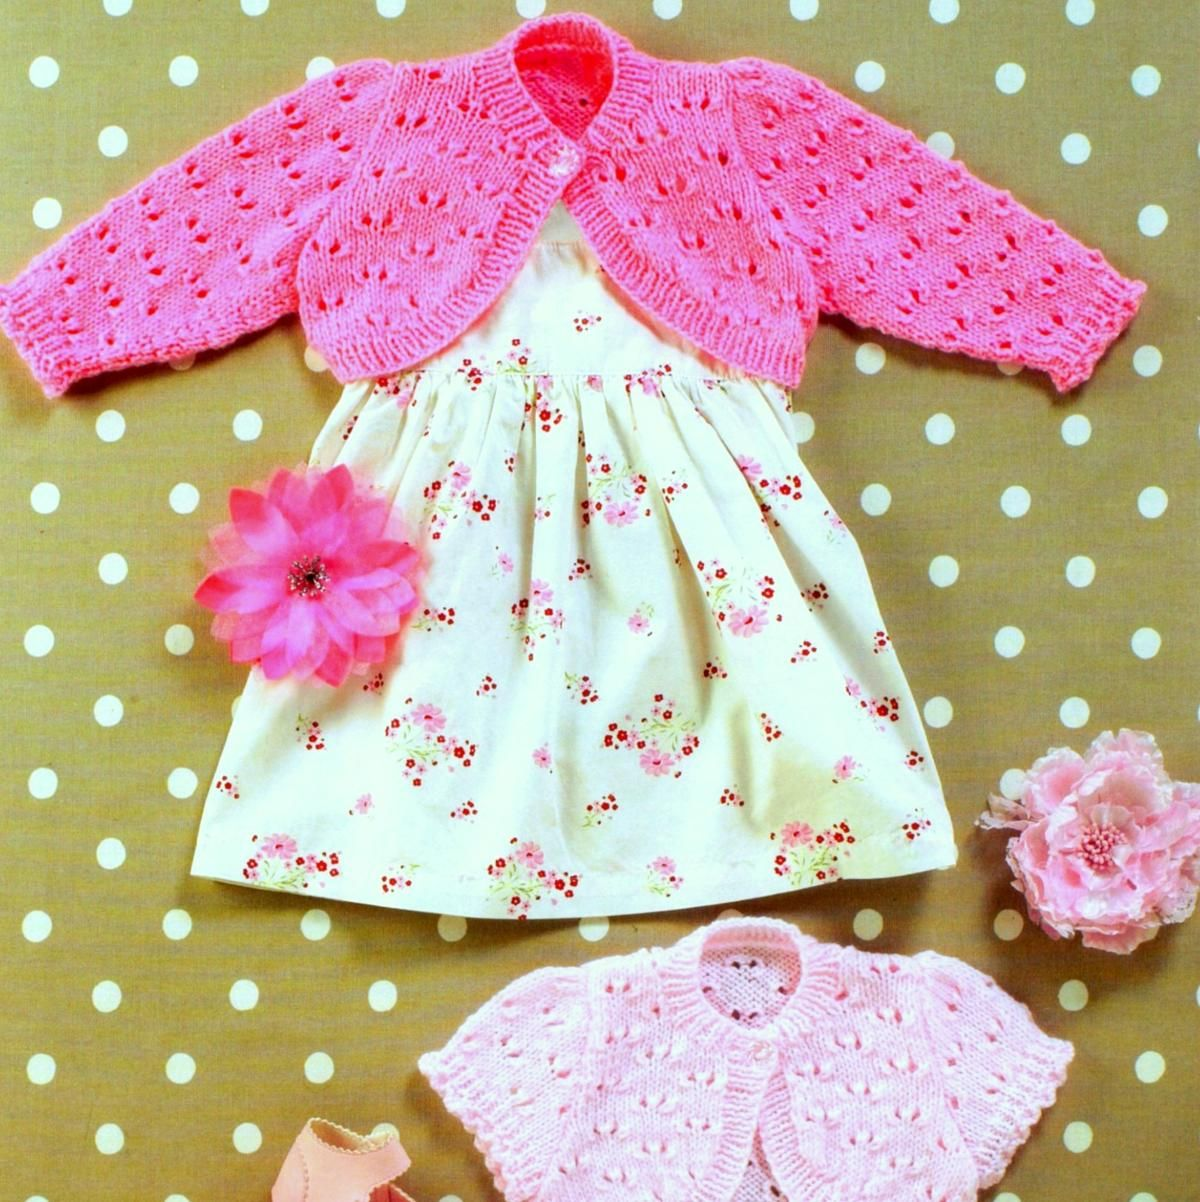 Baby and Childrens Bolero Shrug Cardigan | Craftsy | Baby ...